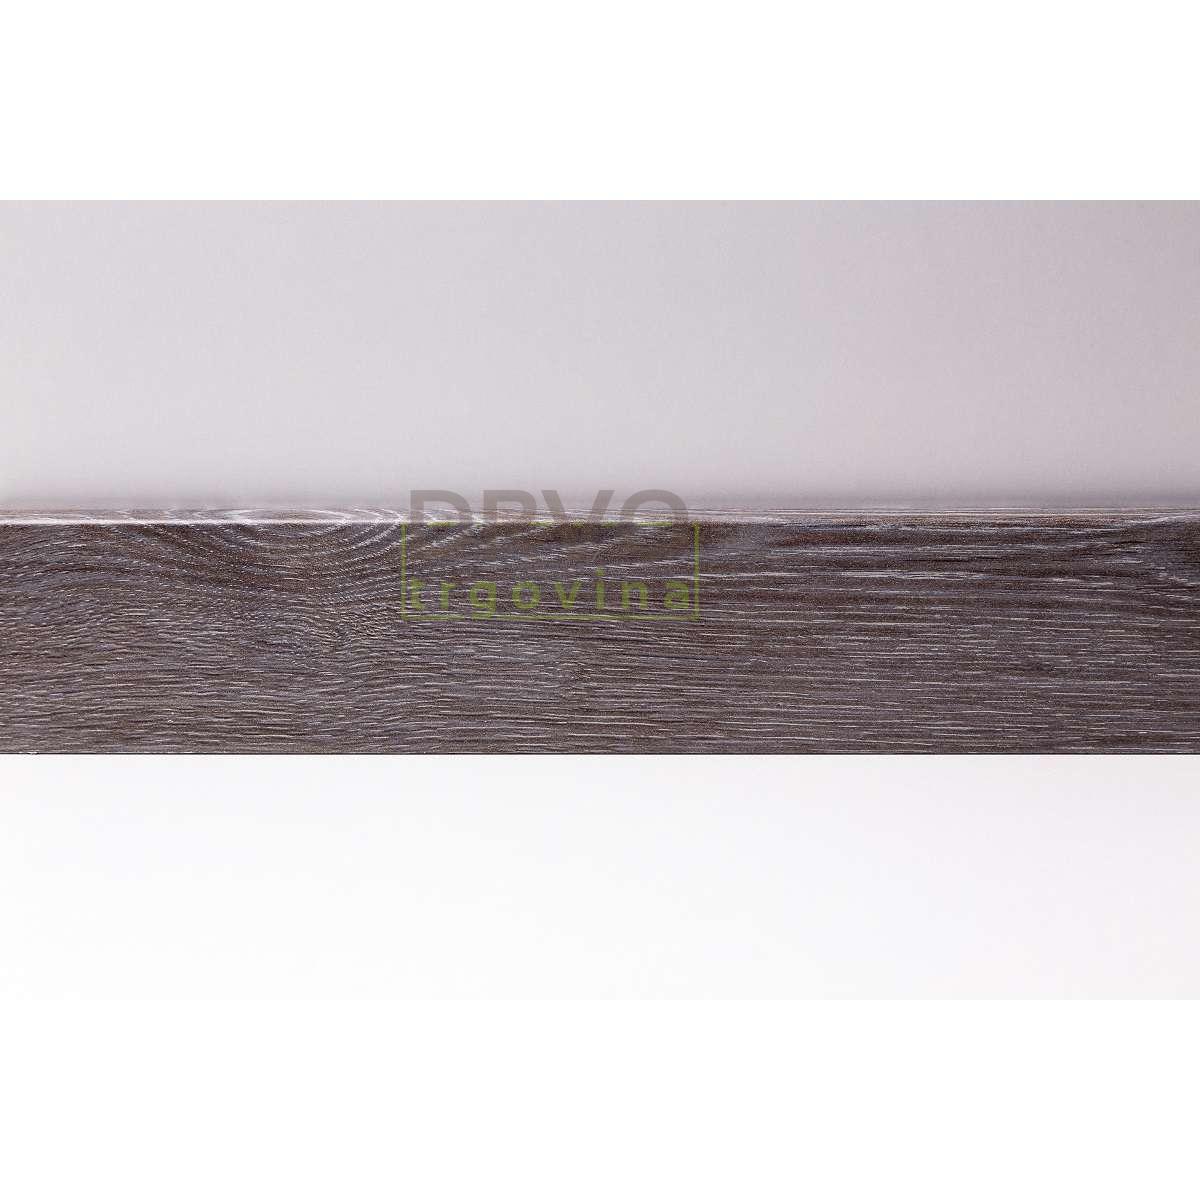 LETVICA ZA LAMINAT 70mm FOEI03Y SF446L 2046/ K040/3885/8096/K415/K262/5541/4009/K398/K397/CHELSEA  2,4m